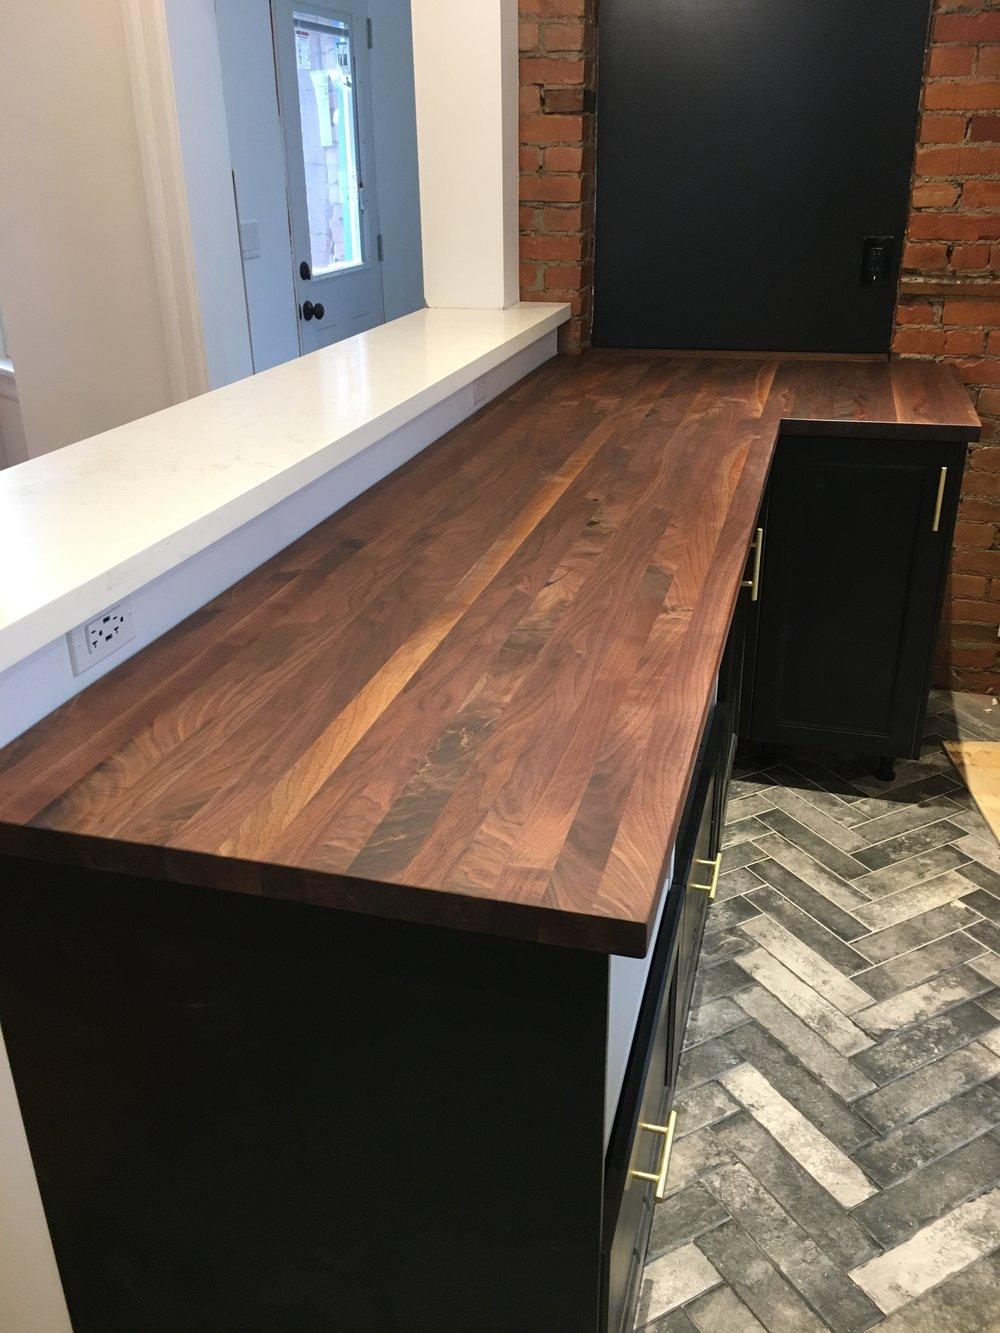 Walnut butcher block counter